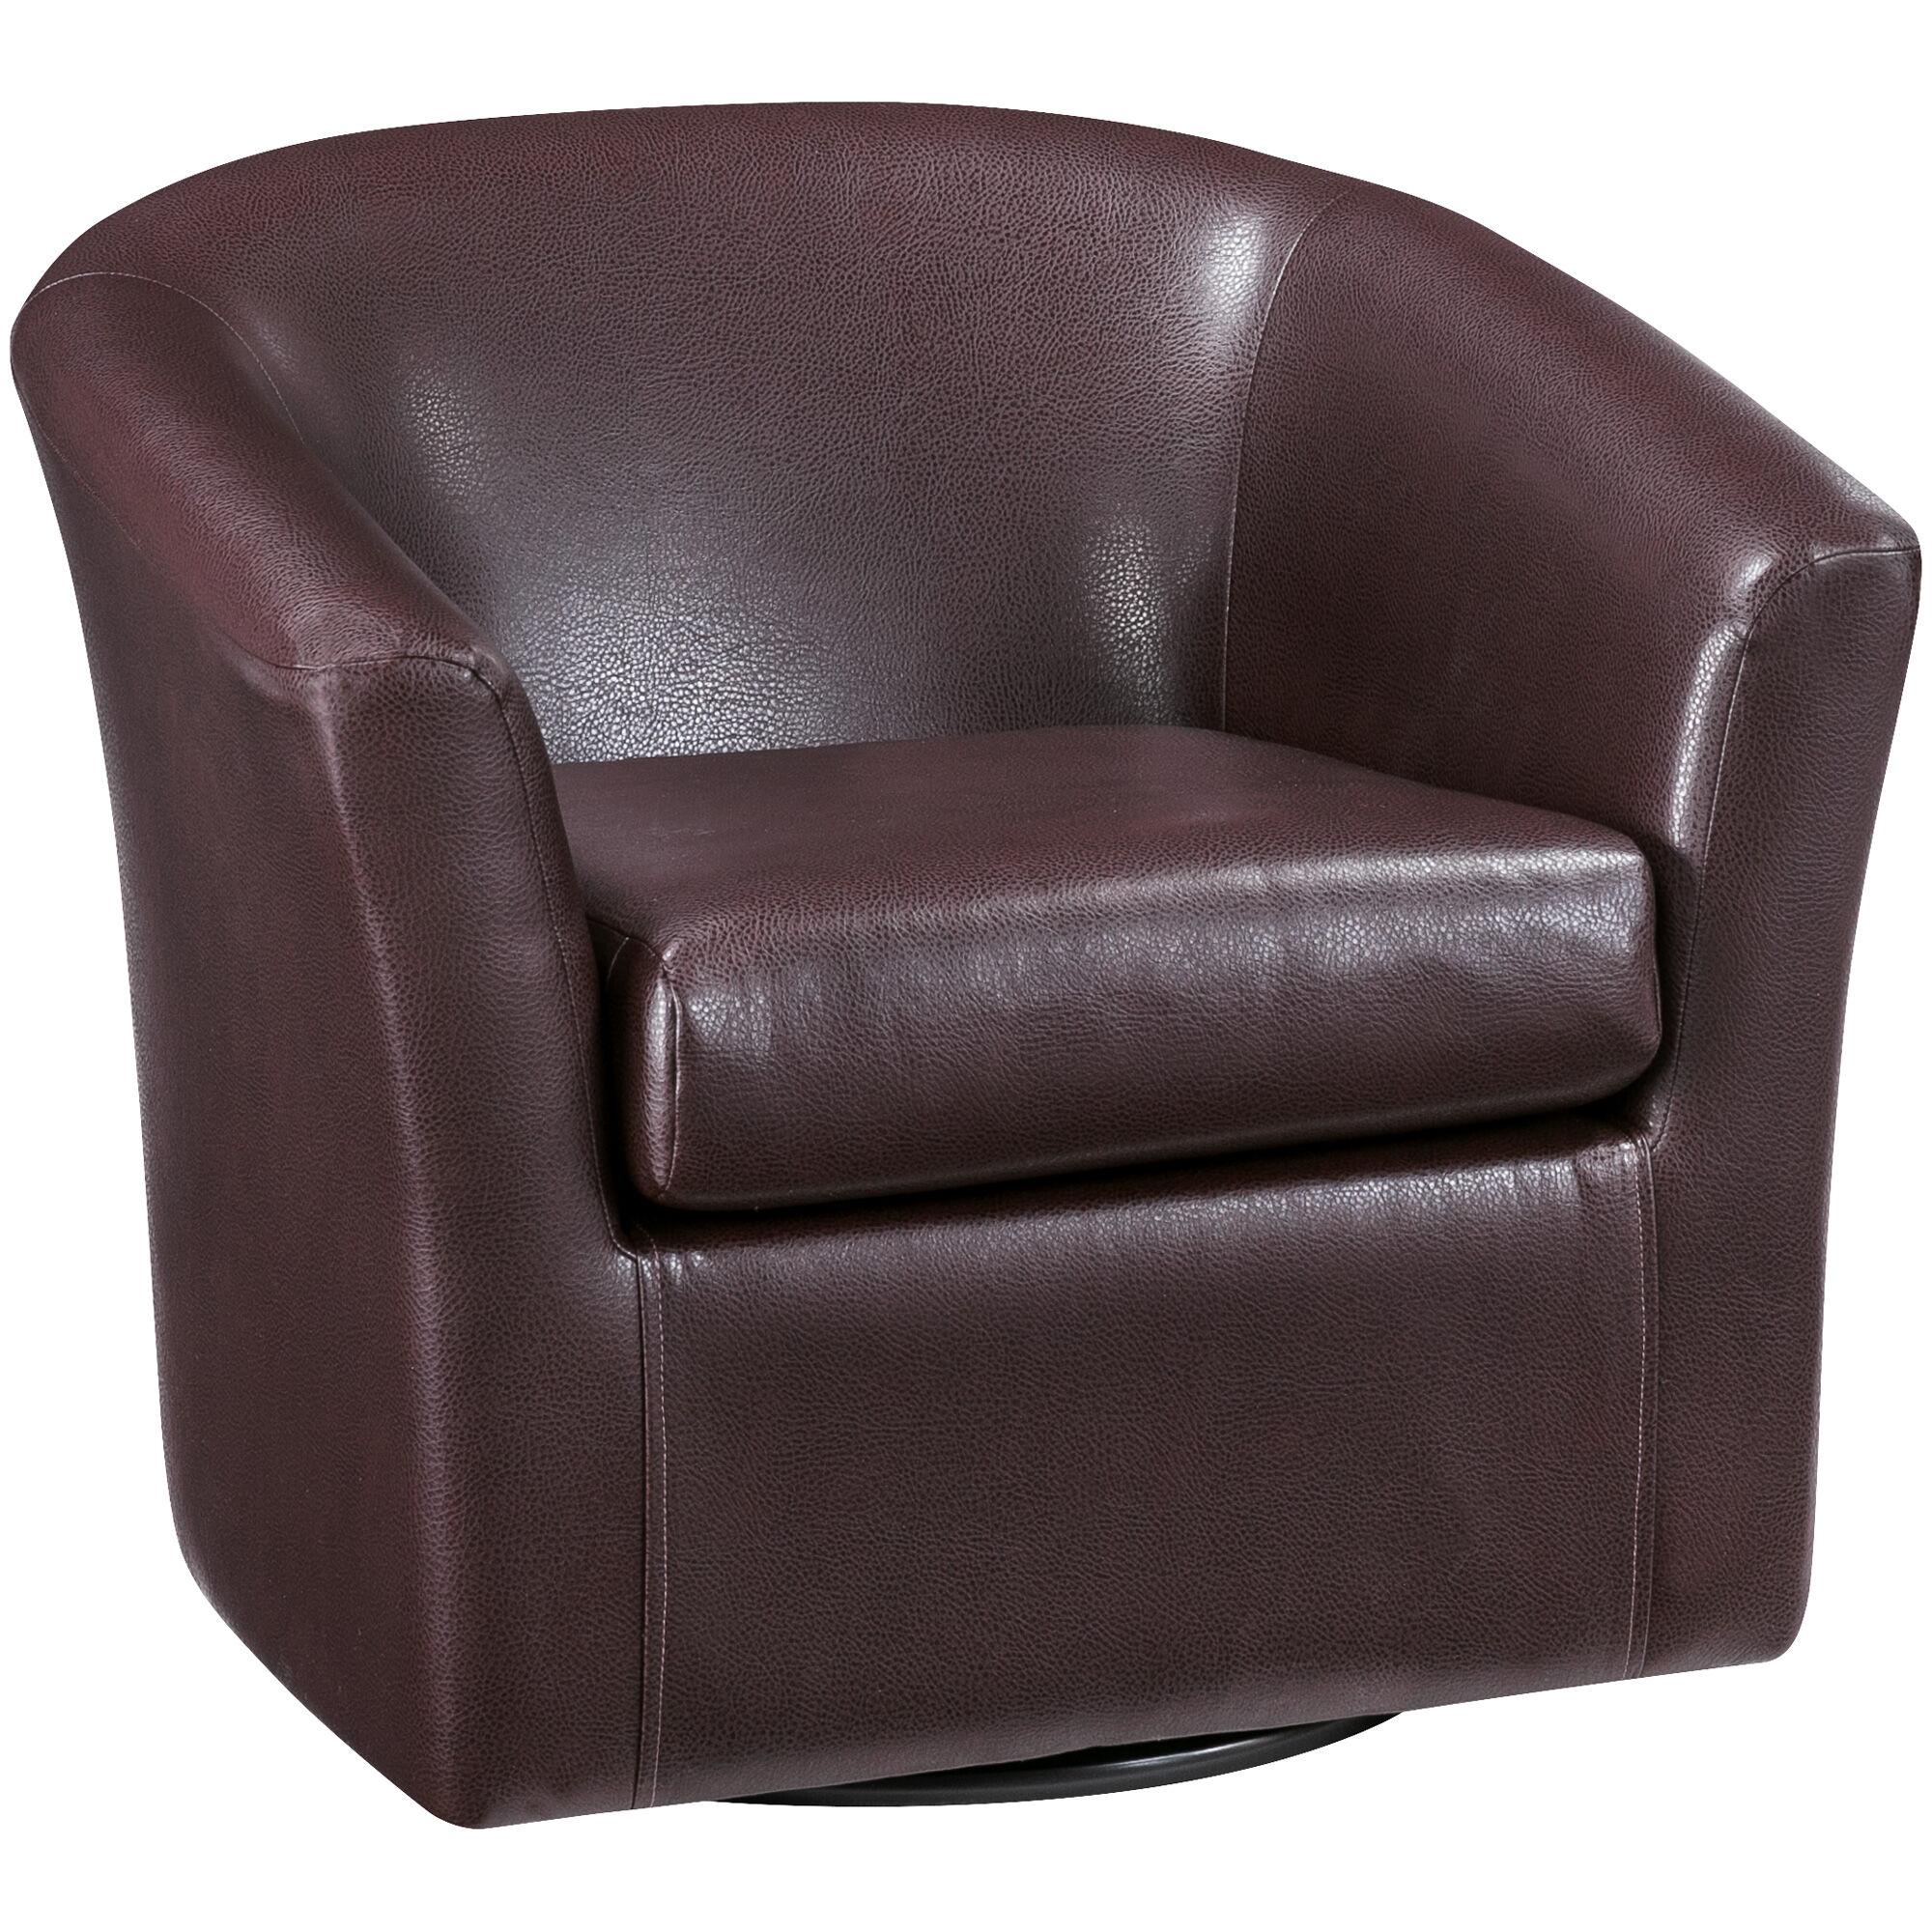 Slumberland Furniture Sten Cognac Swivel Chair